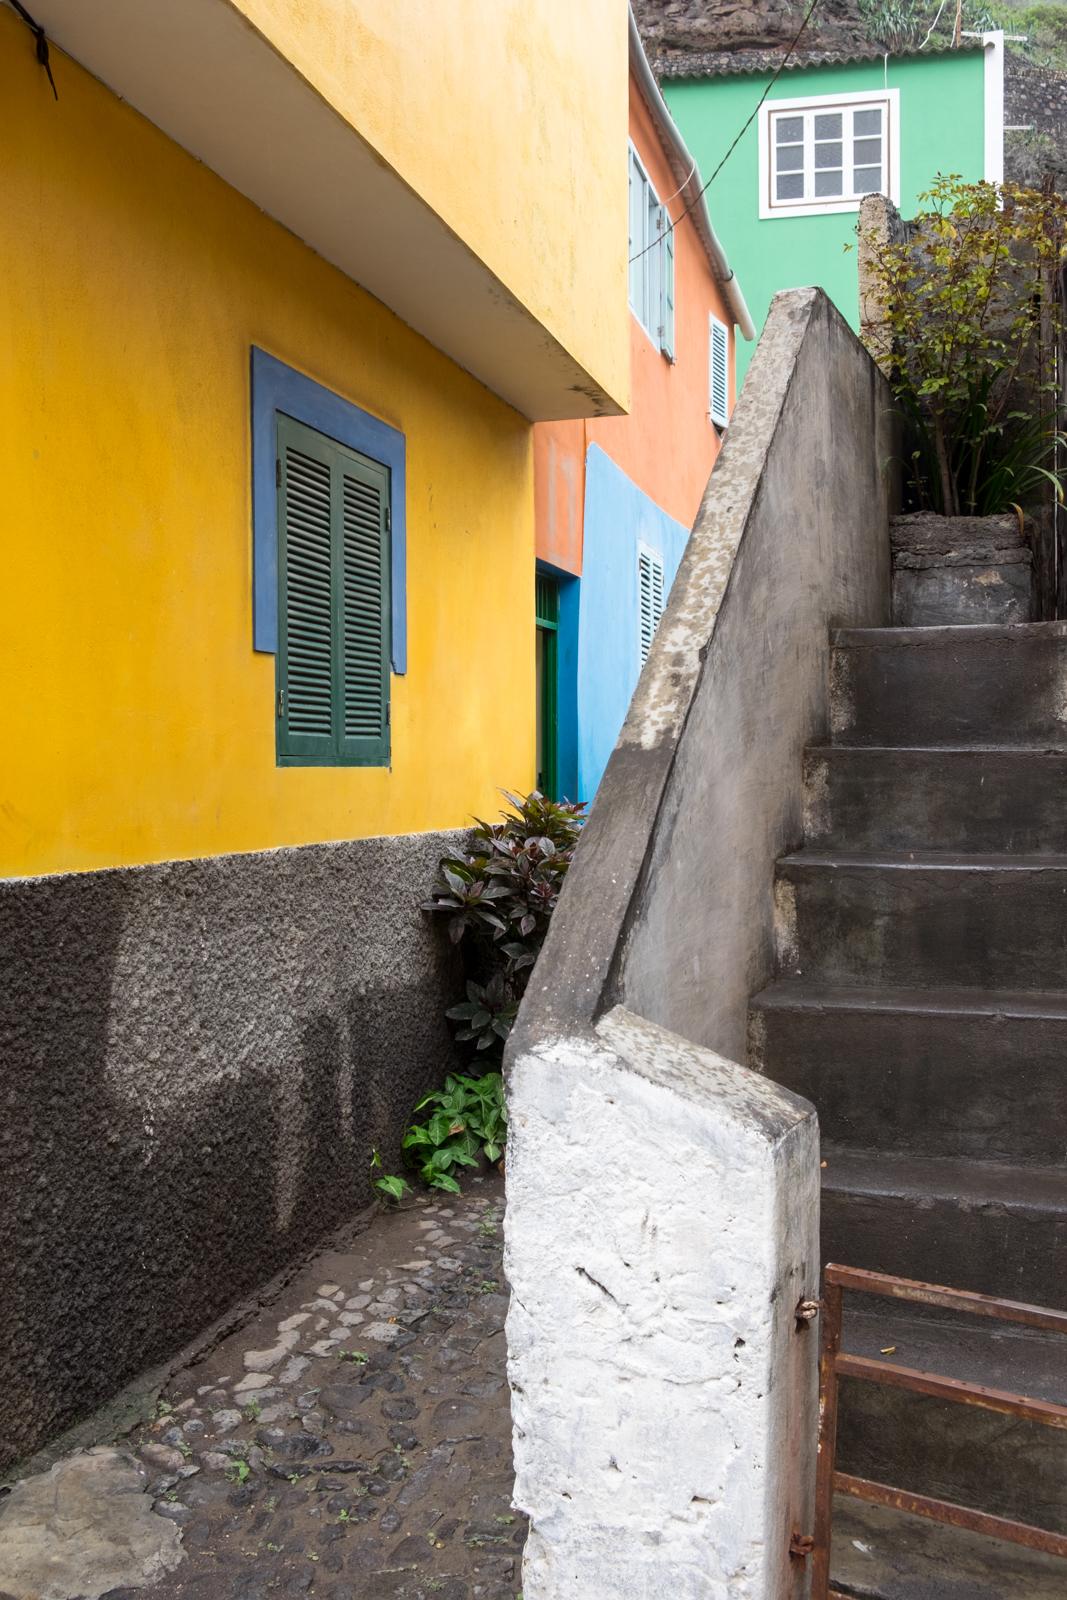 DSCF9936 - It never rains on Cabo Verde